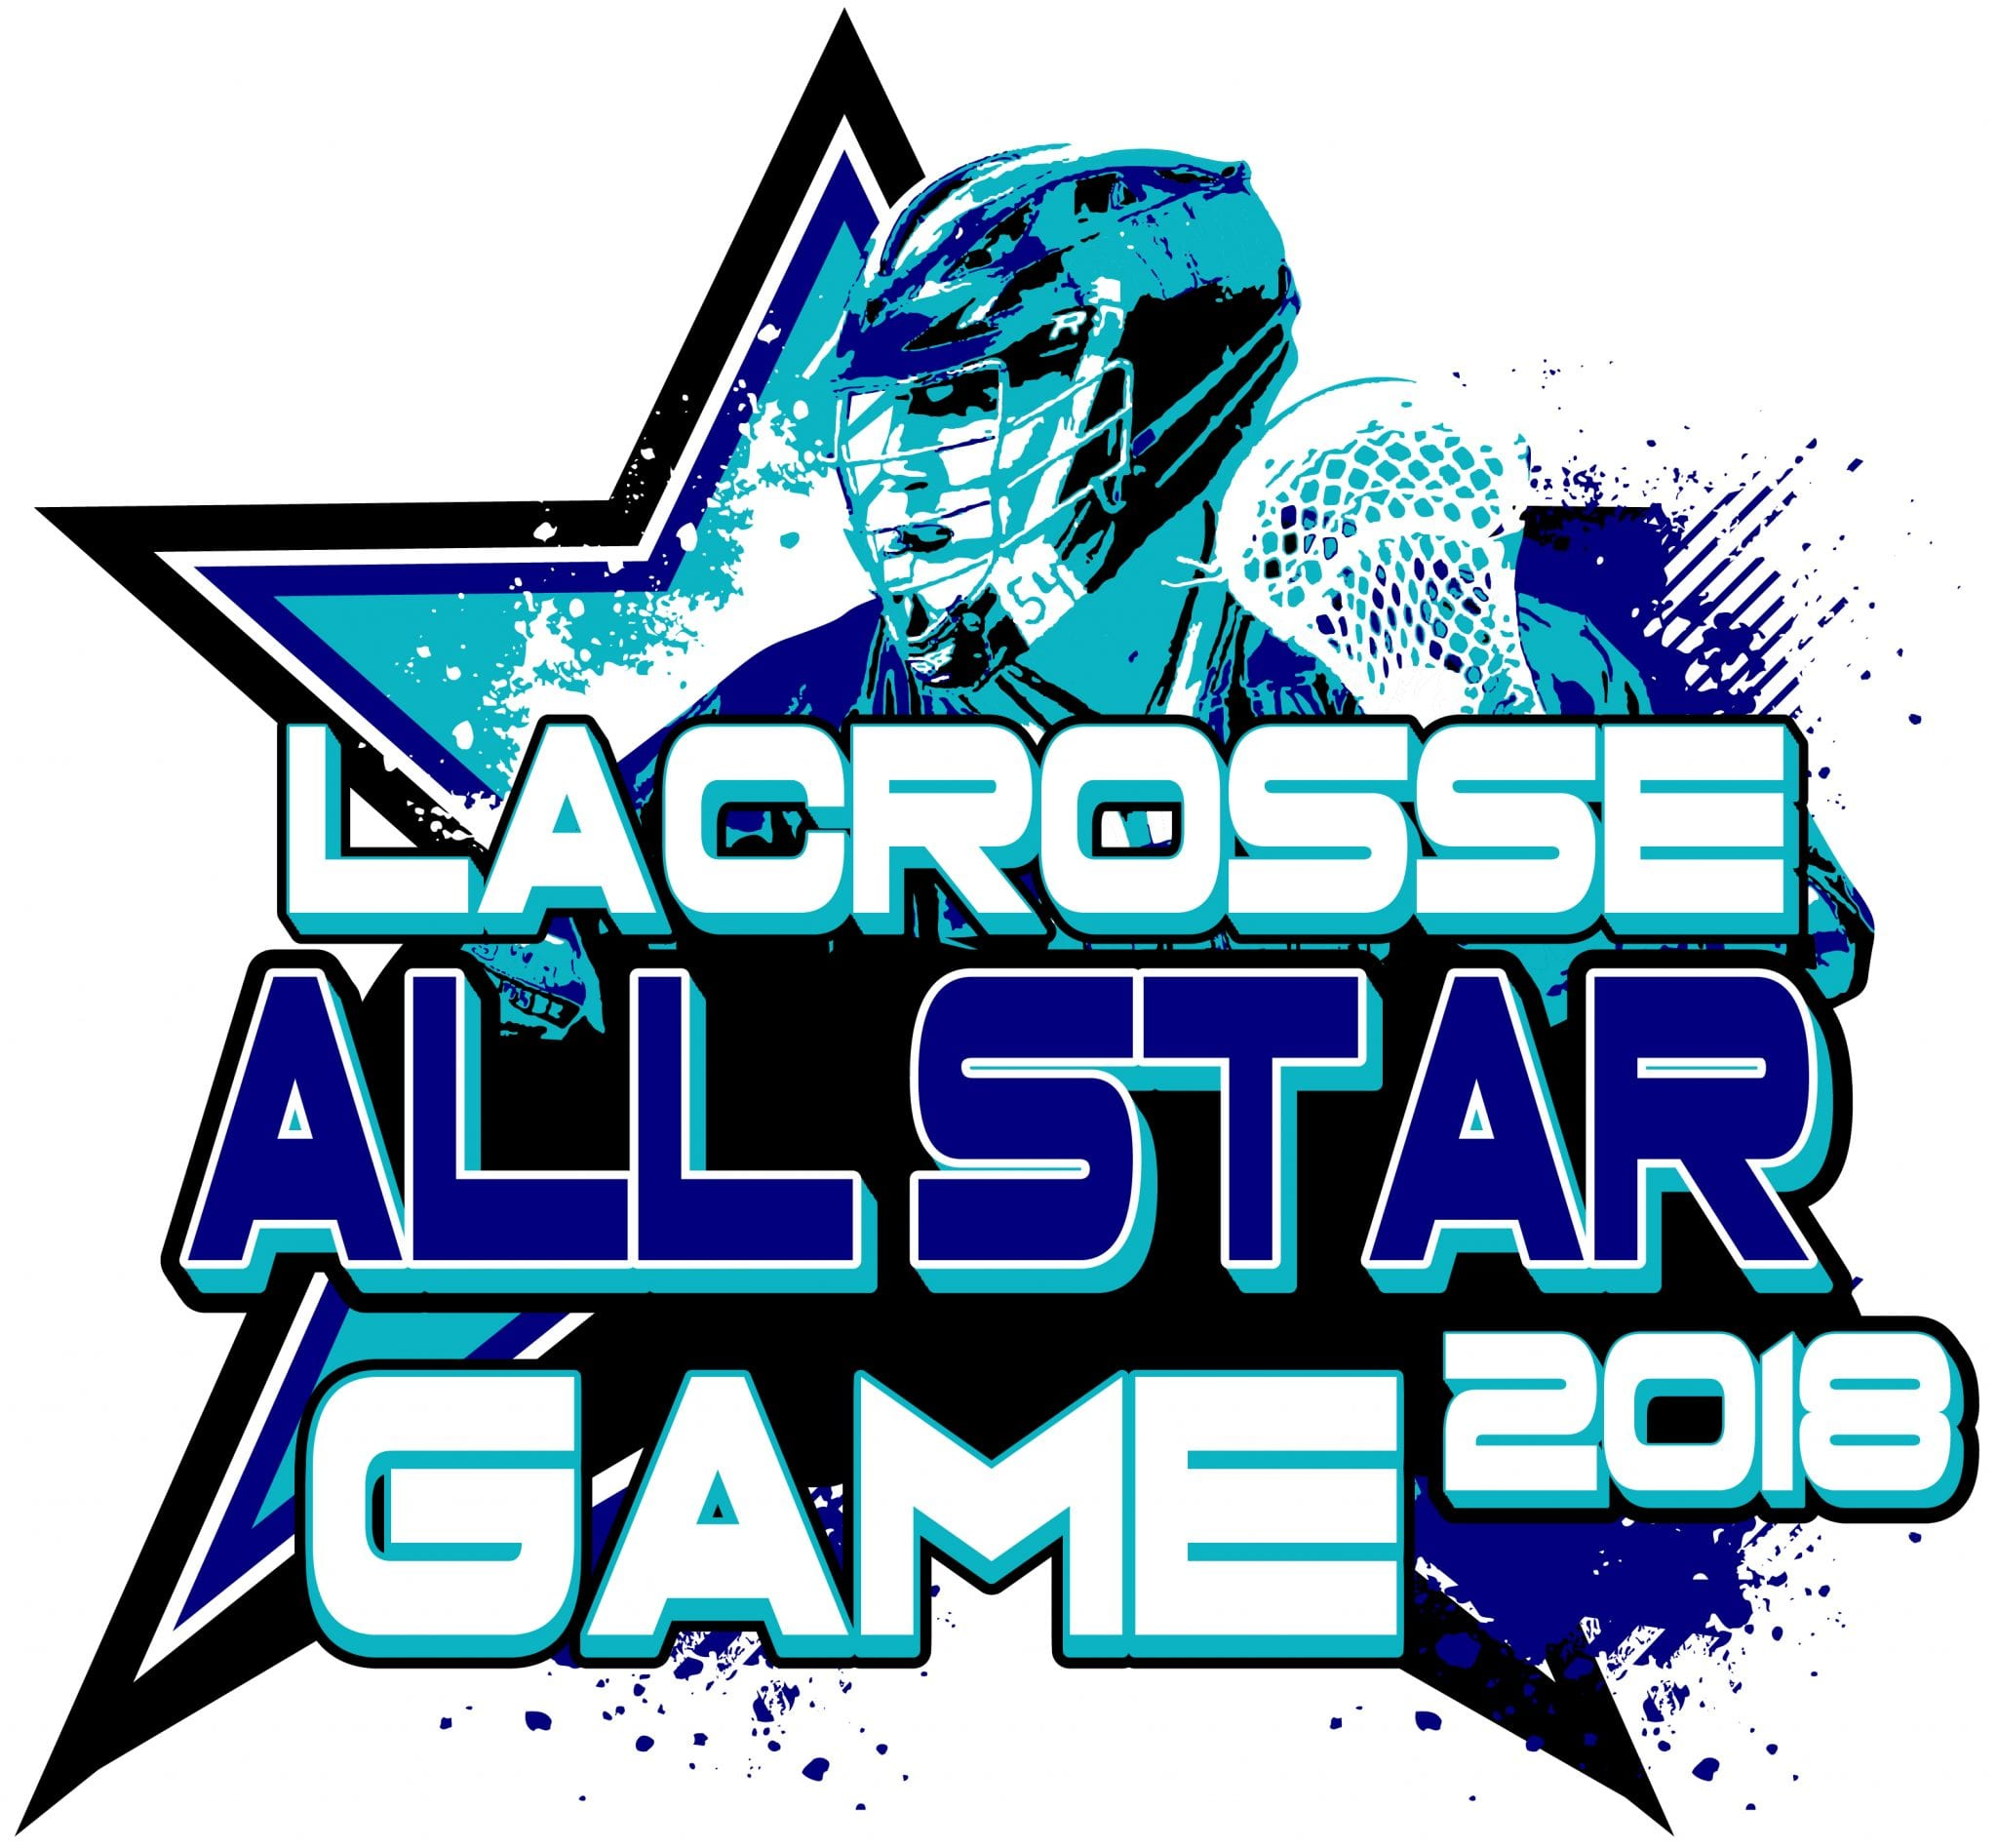 LACROSSE ALL STAR GAME 2018 T-shirt vector logo design for print